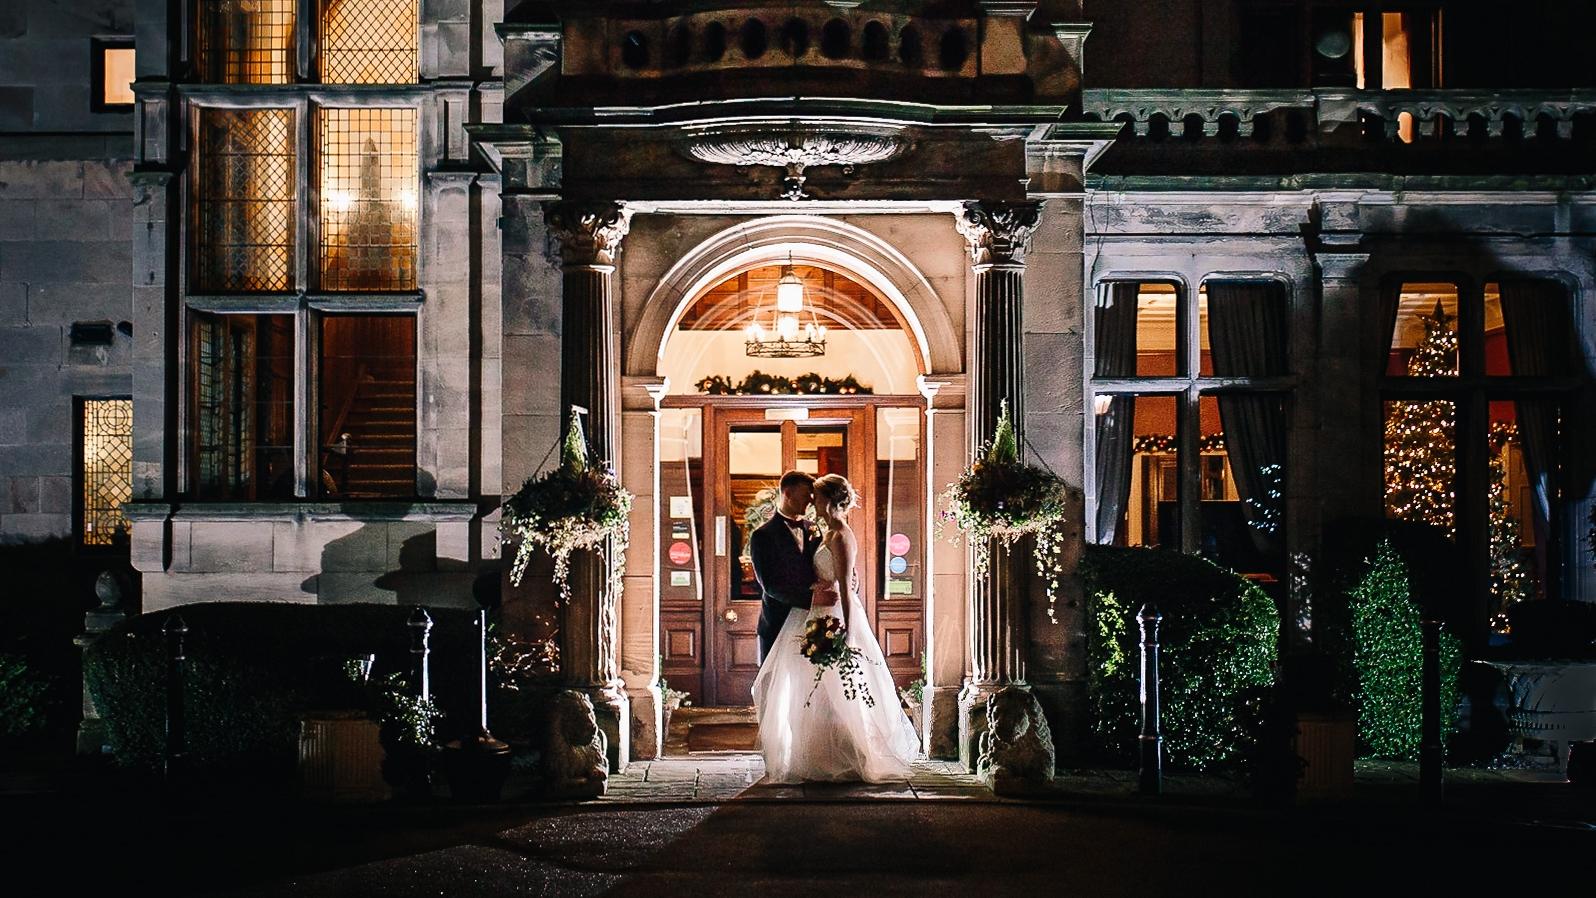 CHESHIRE WEDDING PHOTOGRAPHER JAMES ANDREW PHOTOGRAPHY